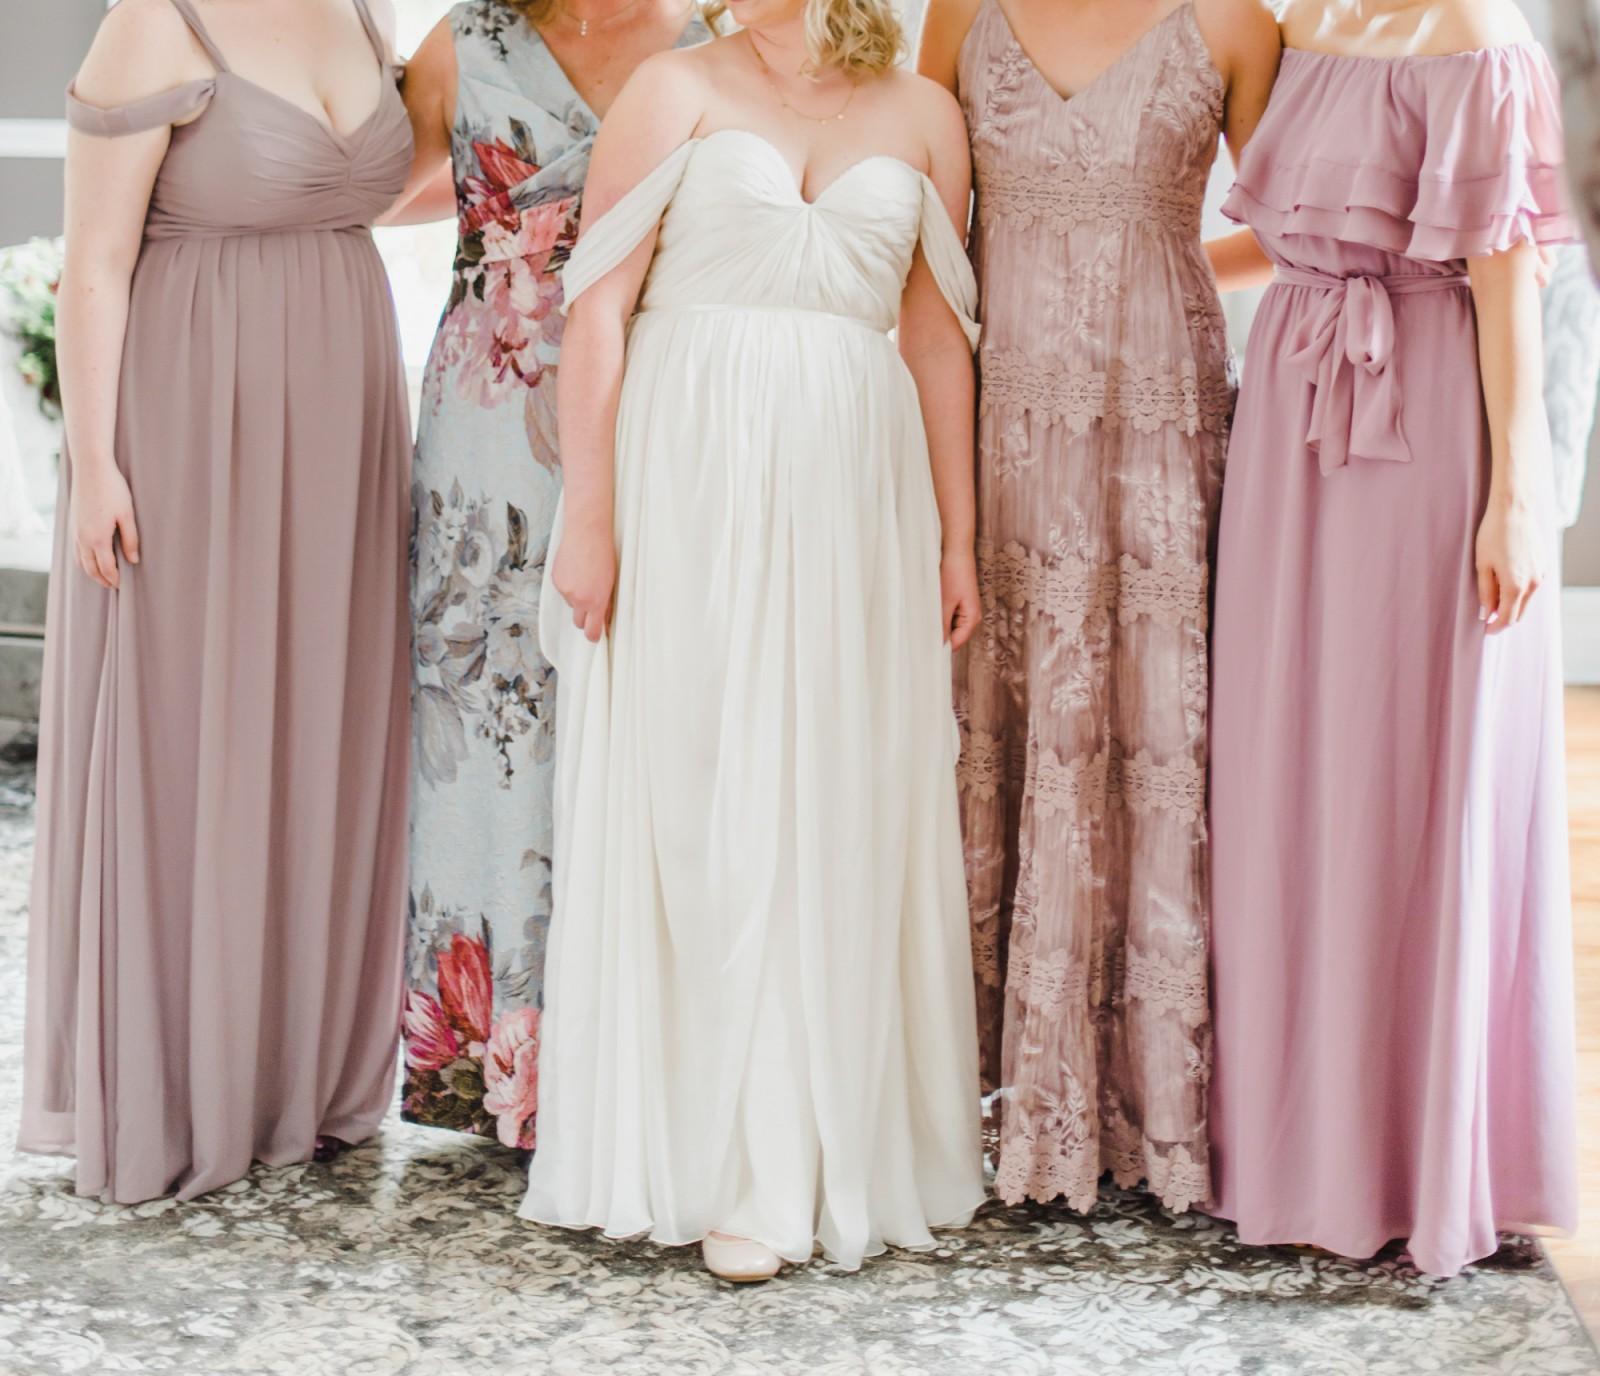 Sarah Seven Practically Perfect Size 10: Practically Perfect Wedding Dress At Websimilar.org